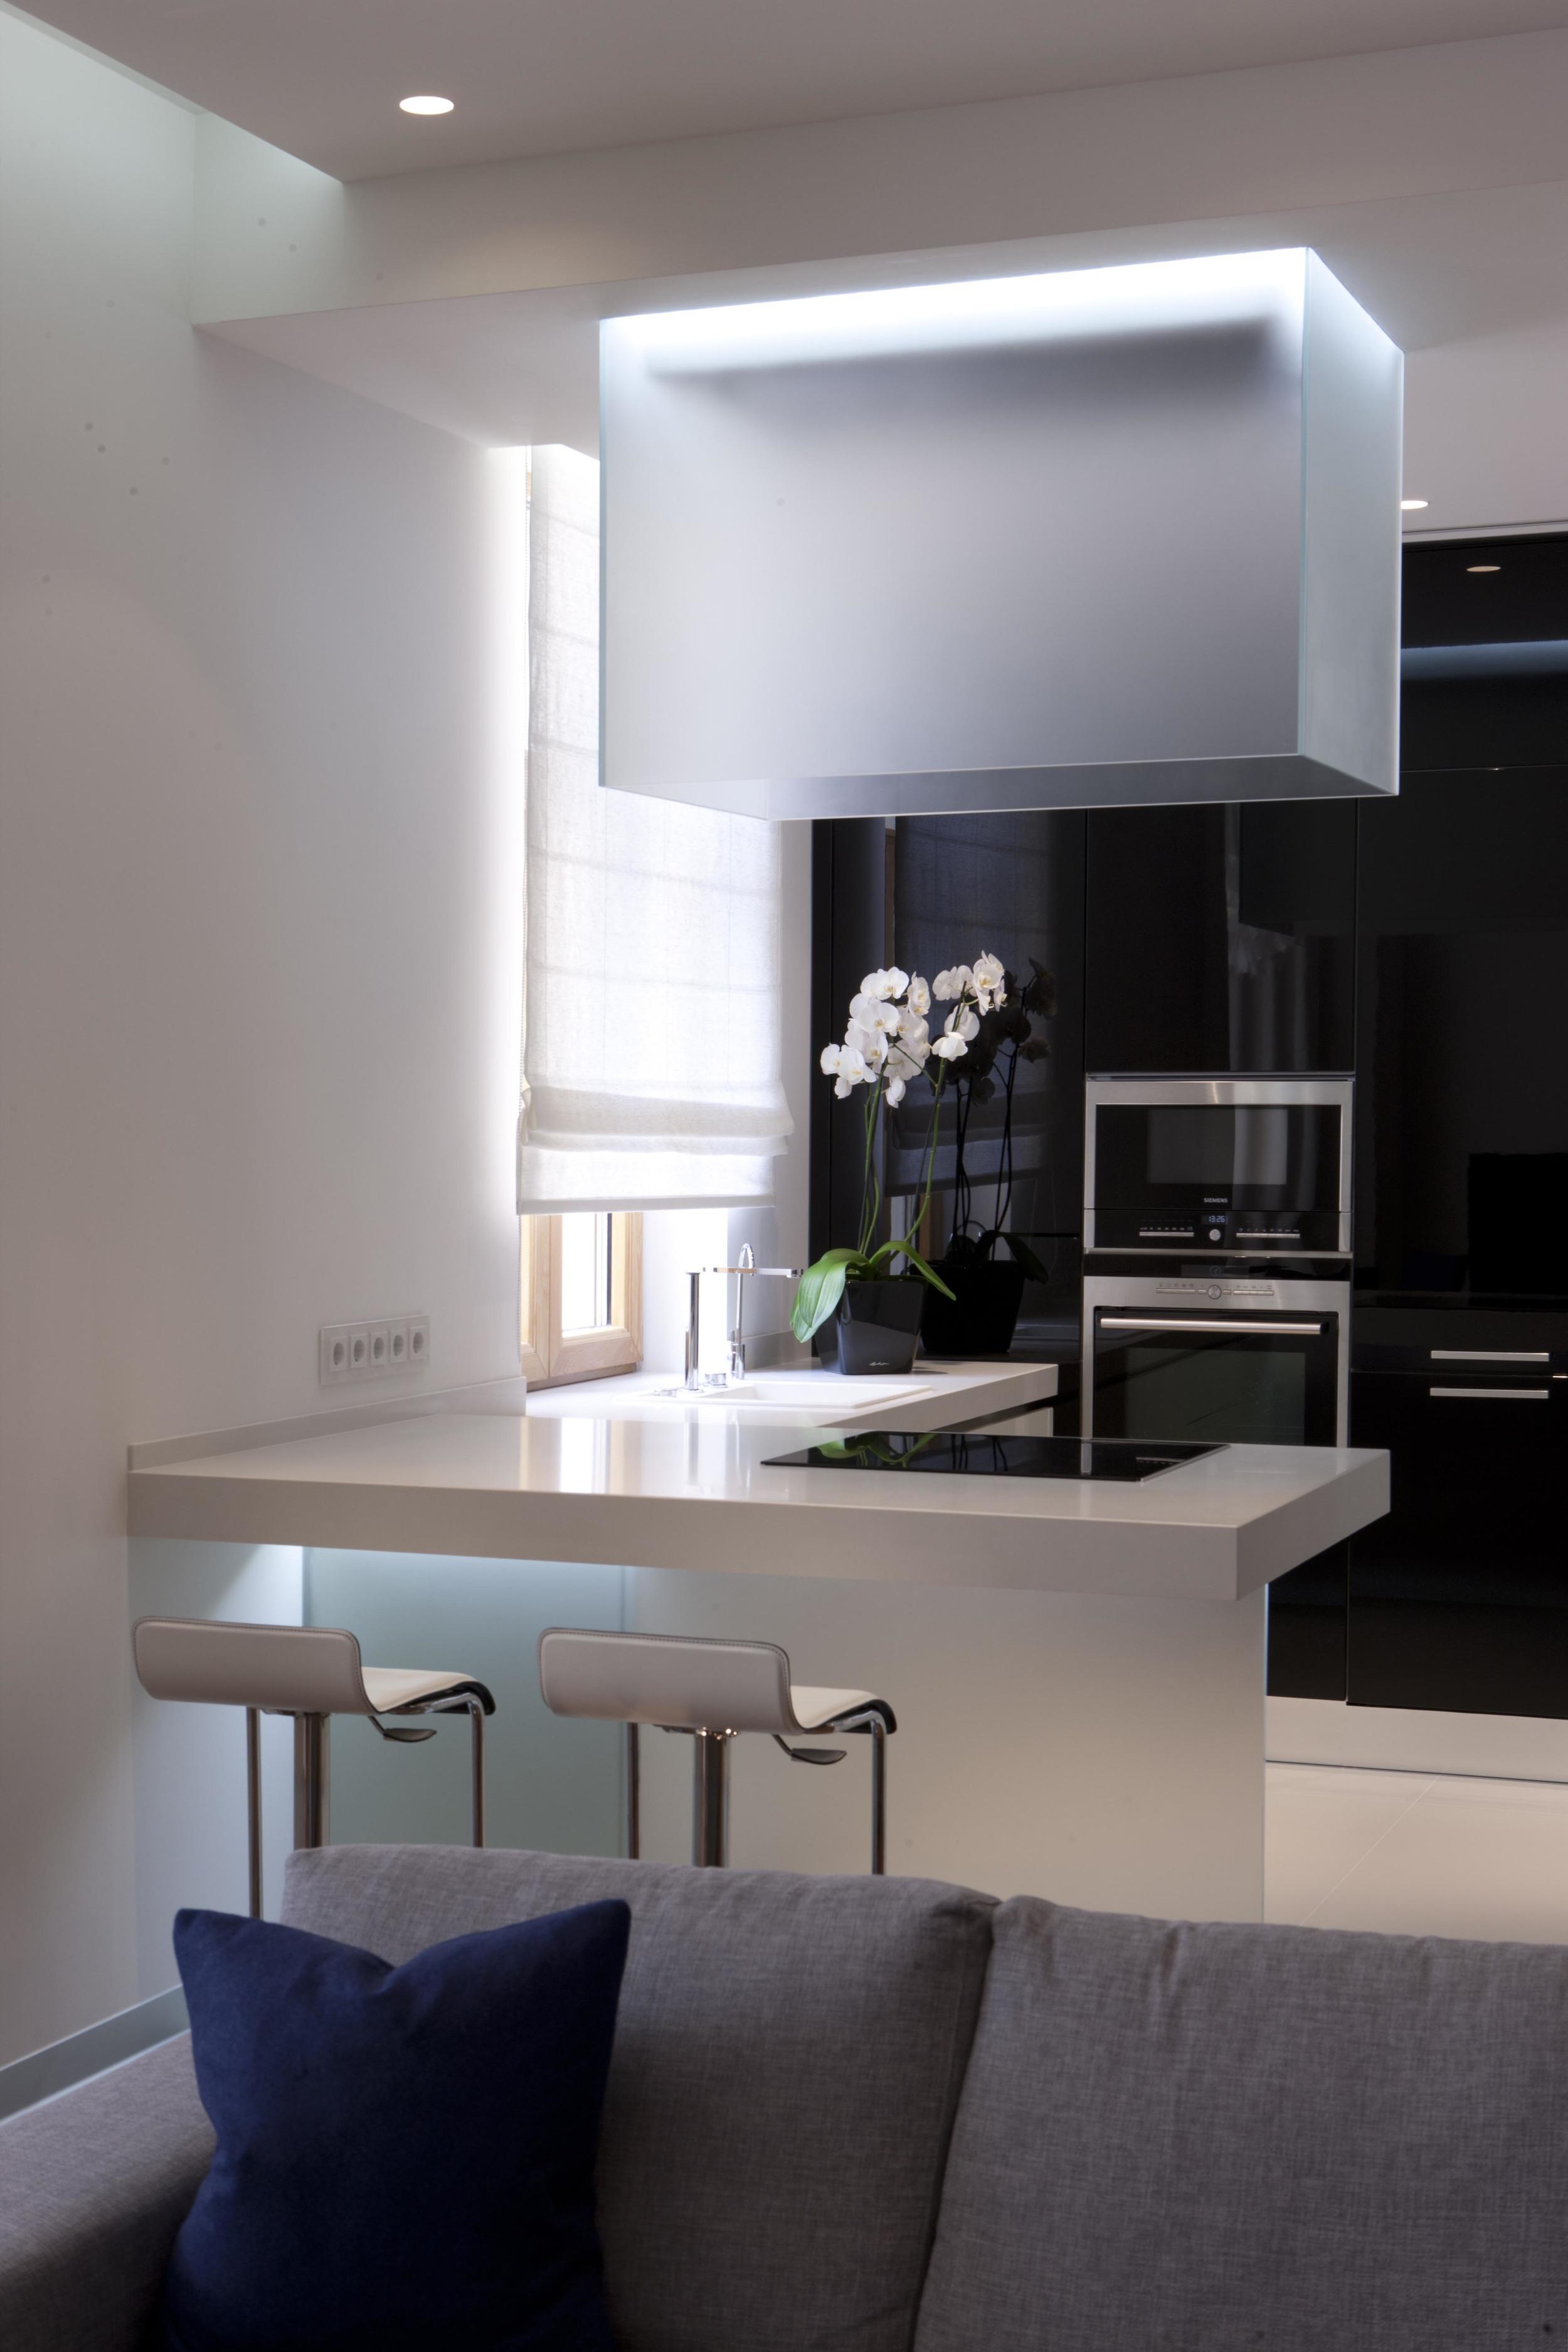 03_ub_pechatnikov3_livingroom_3.jpg